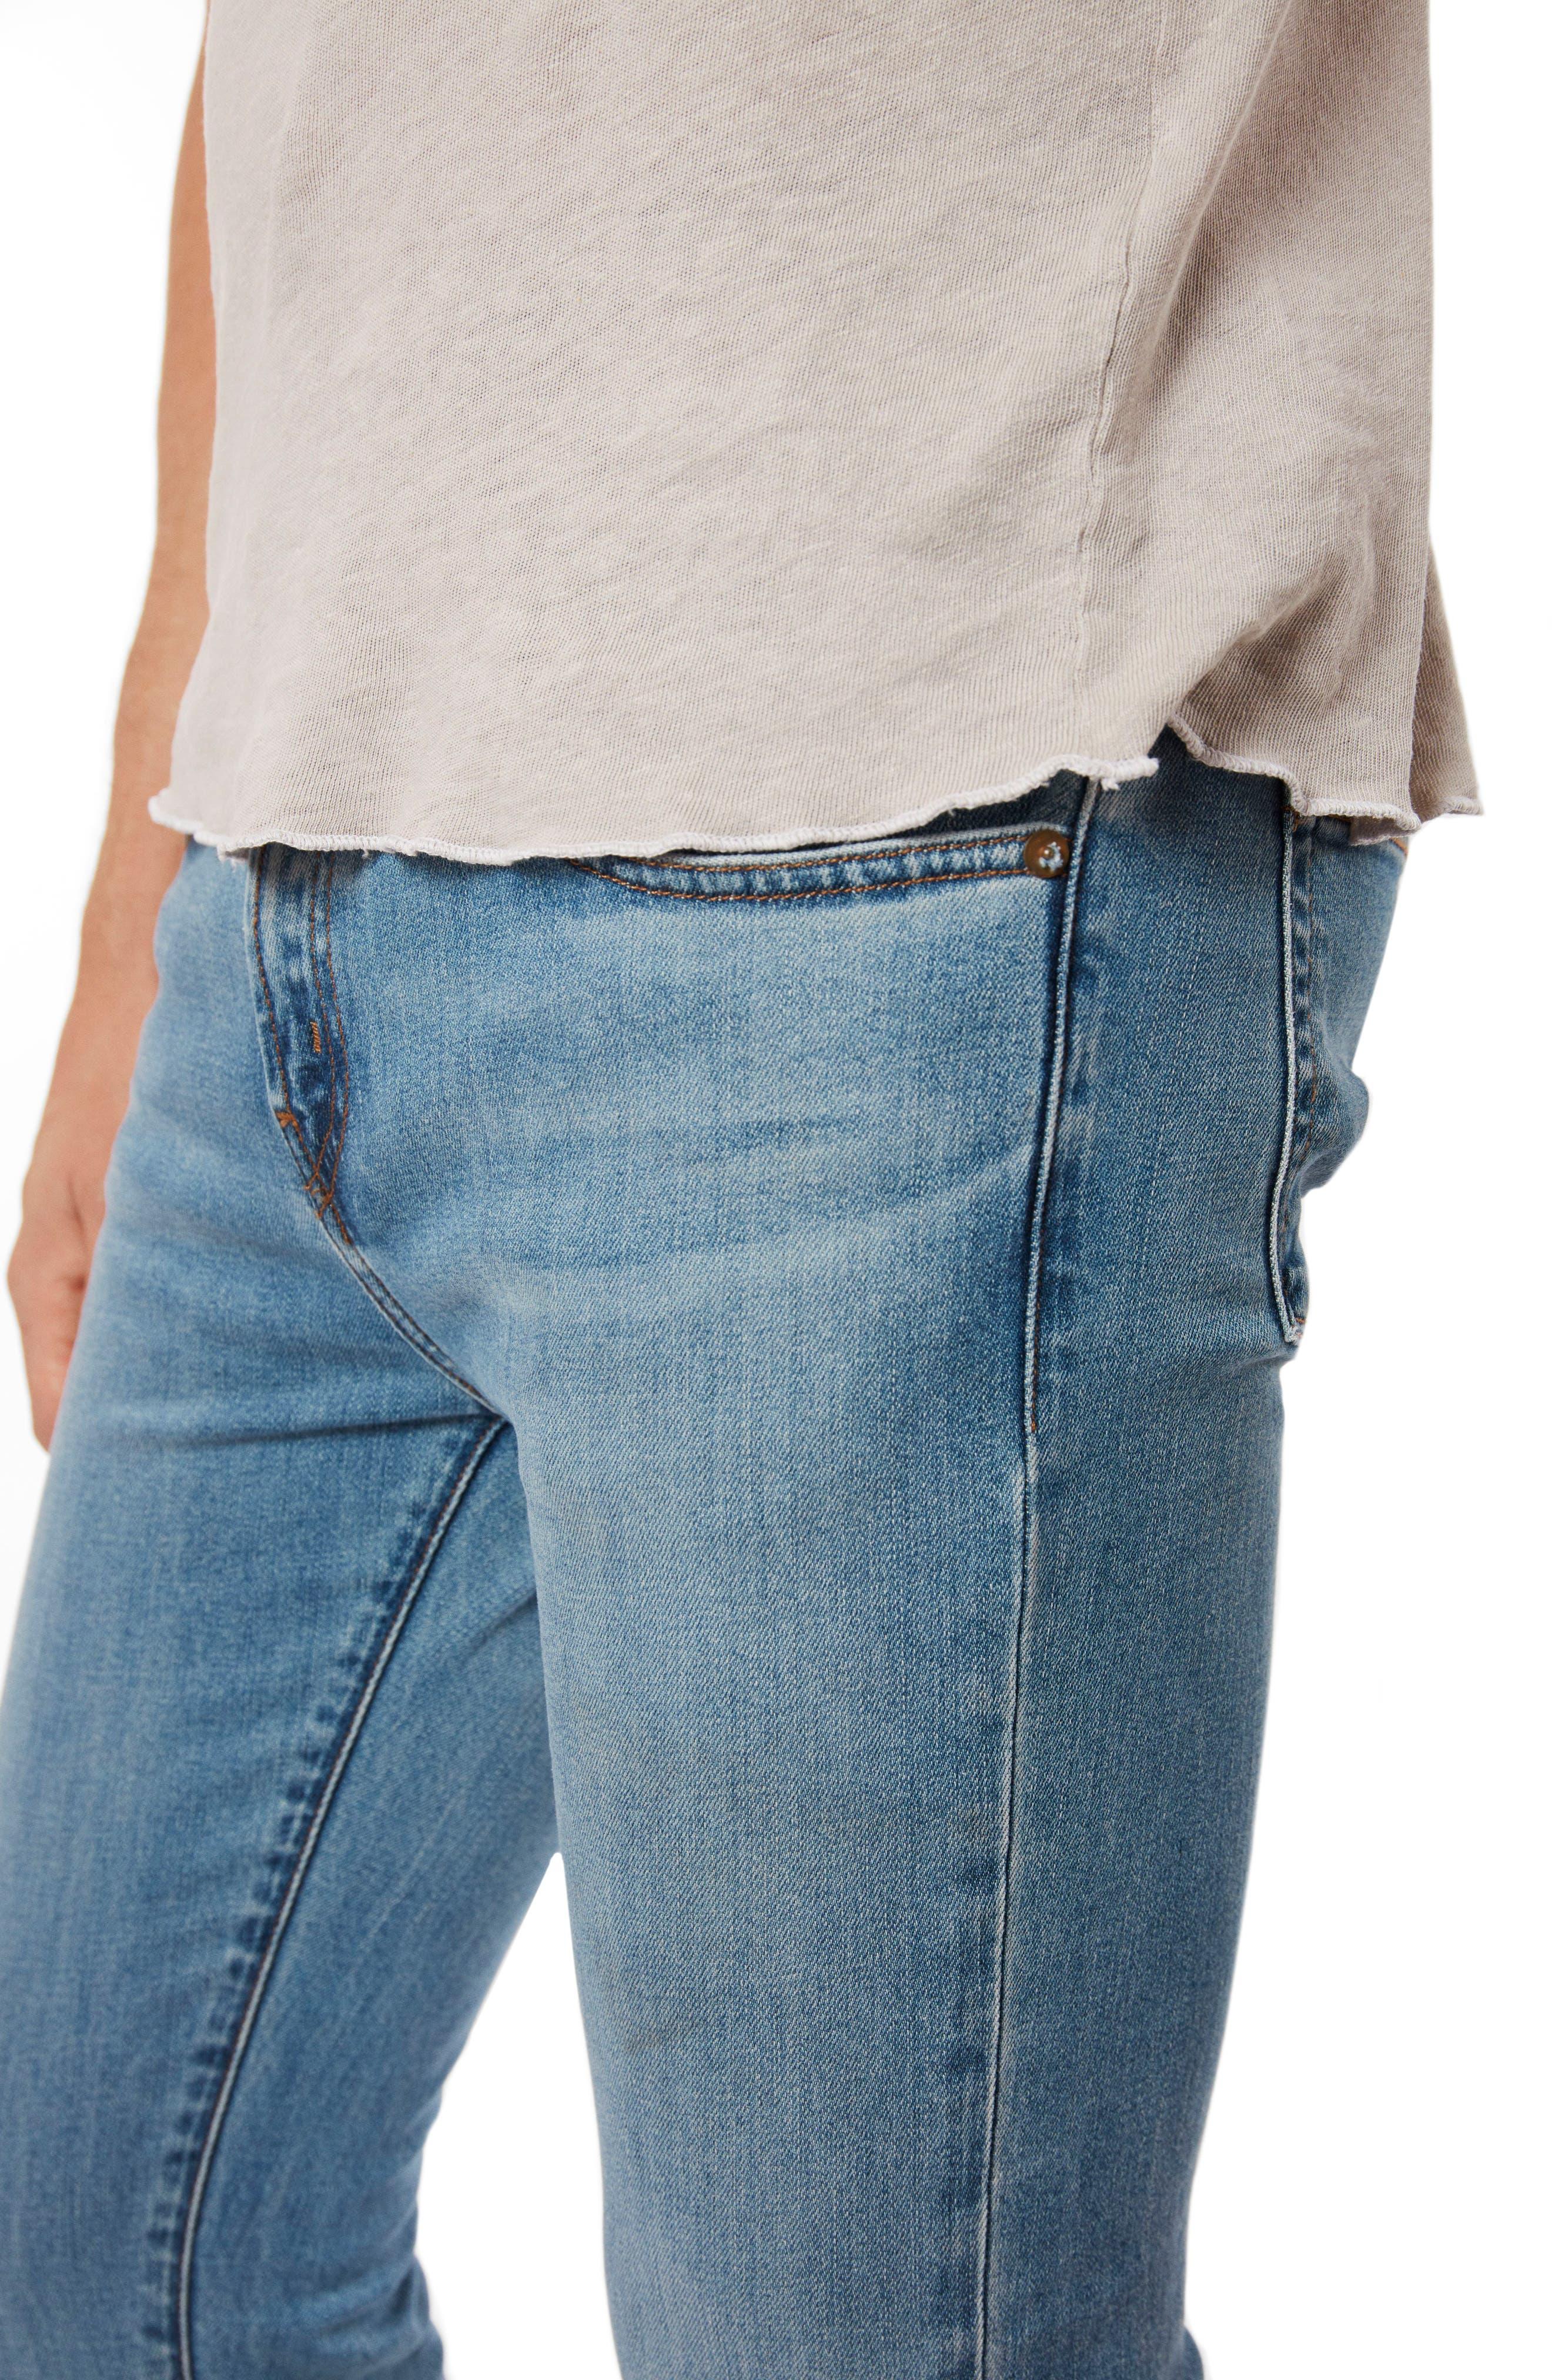 Skinny Fit Jeans,                             Alternate thumbnail 4, color,                             409